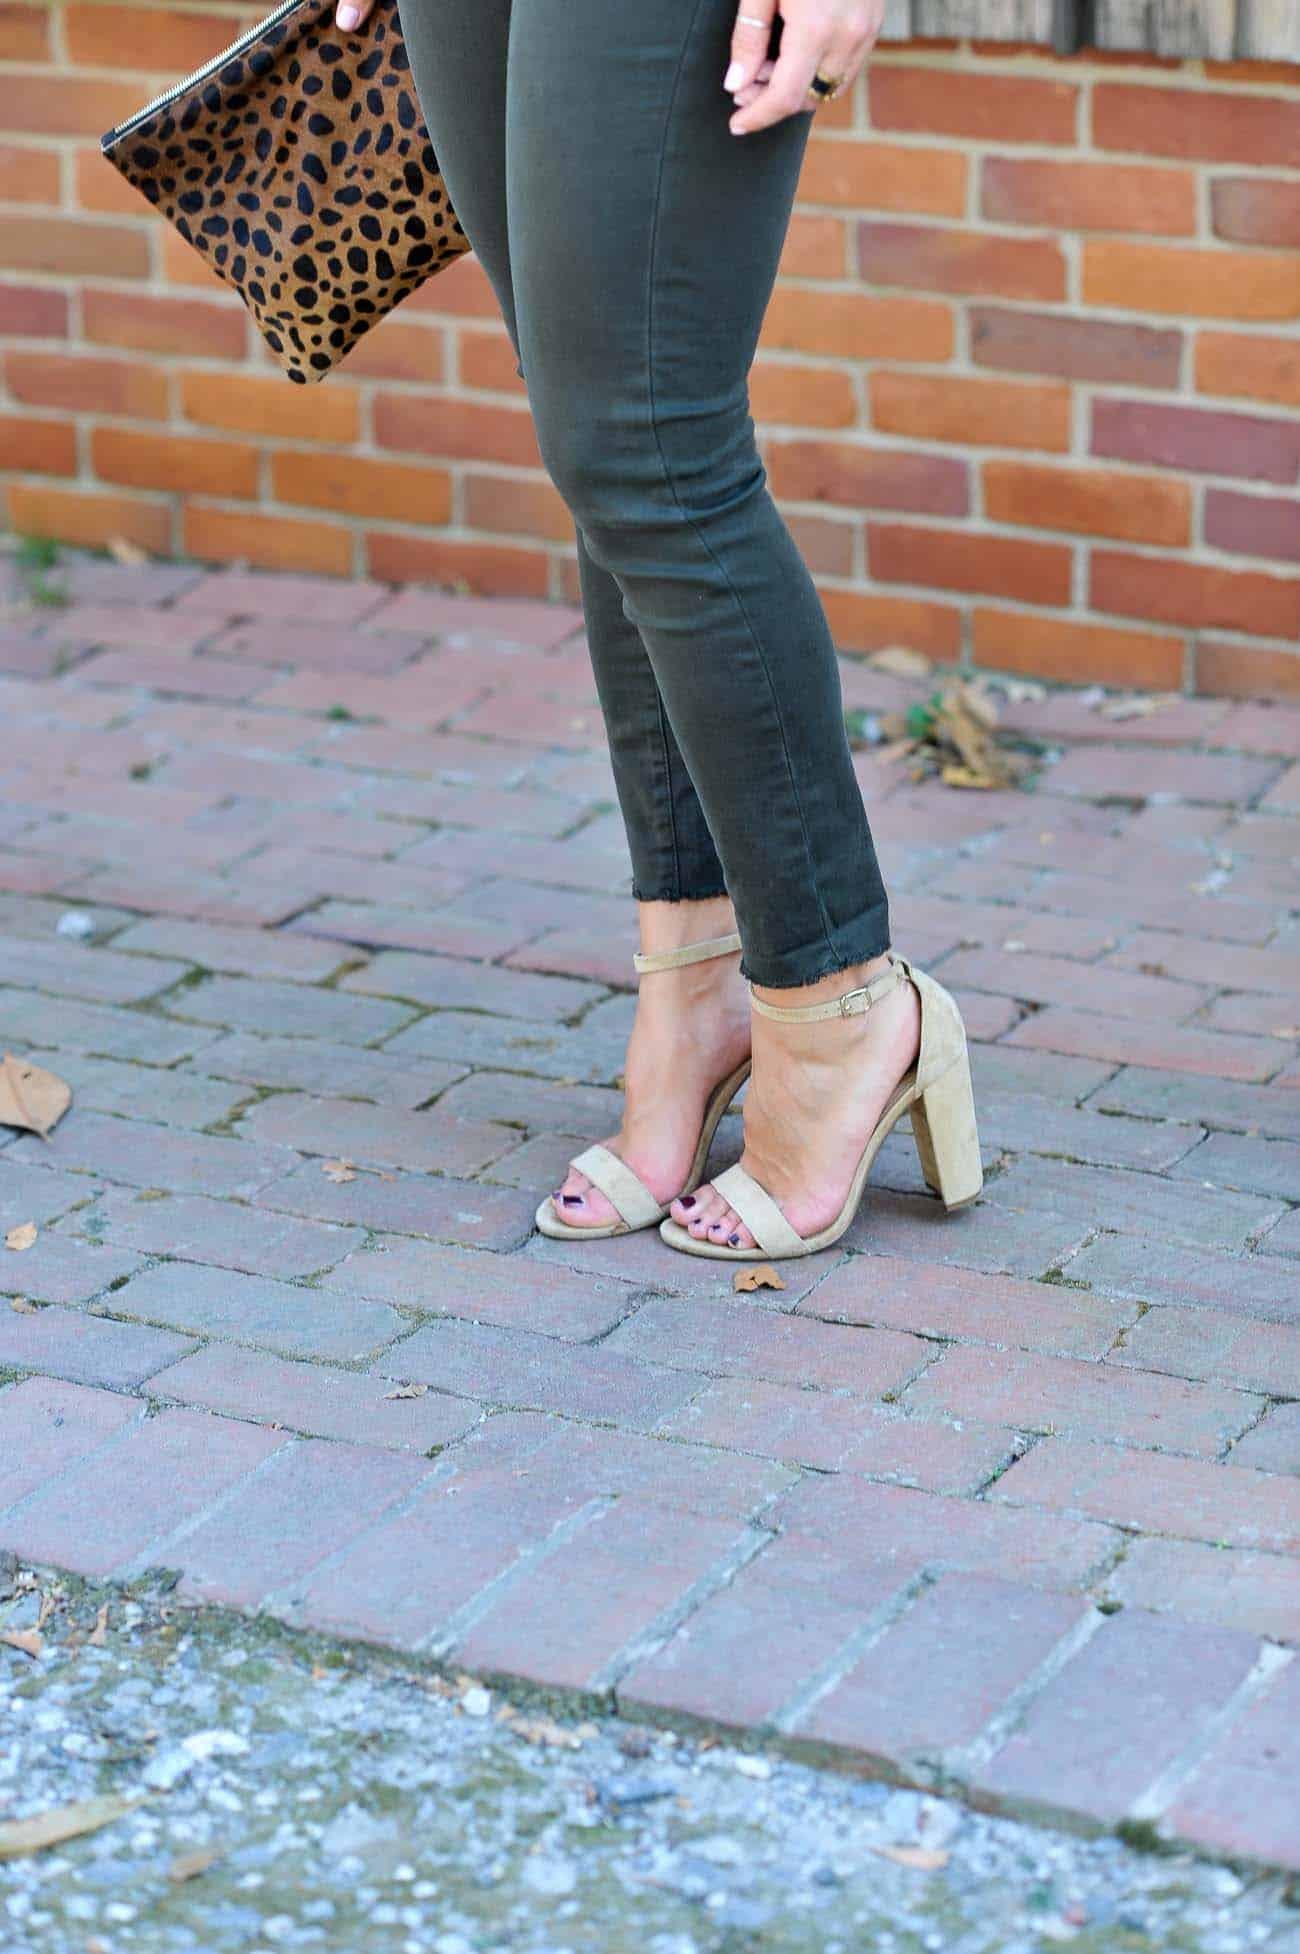 fall outfit ideas, flutter sleeve tops - My Style Vita @mystylevita